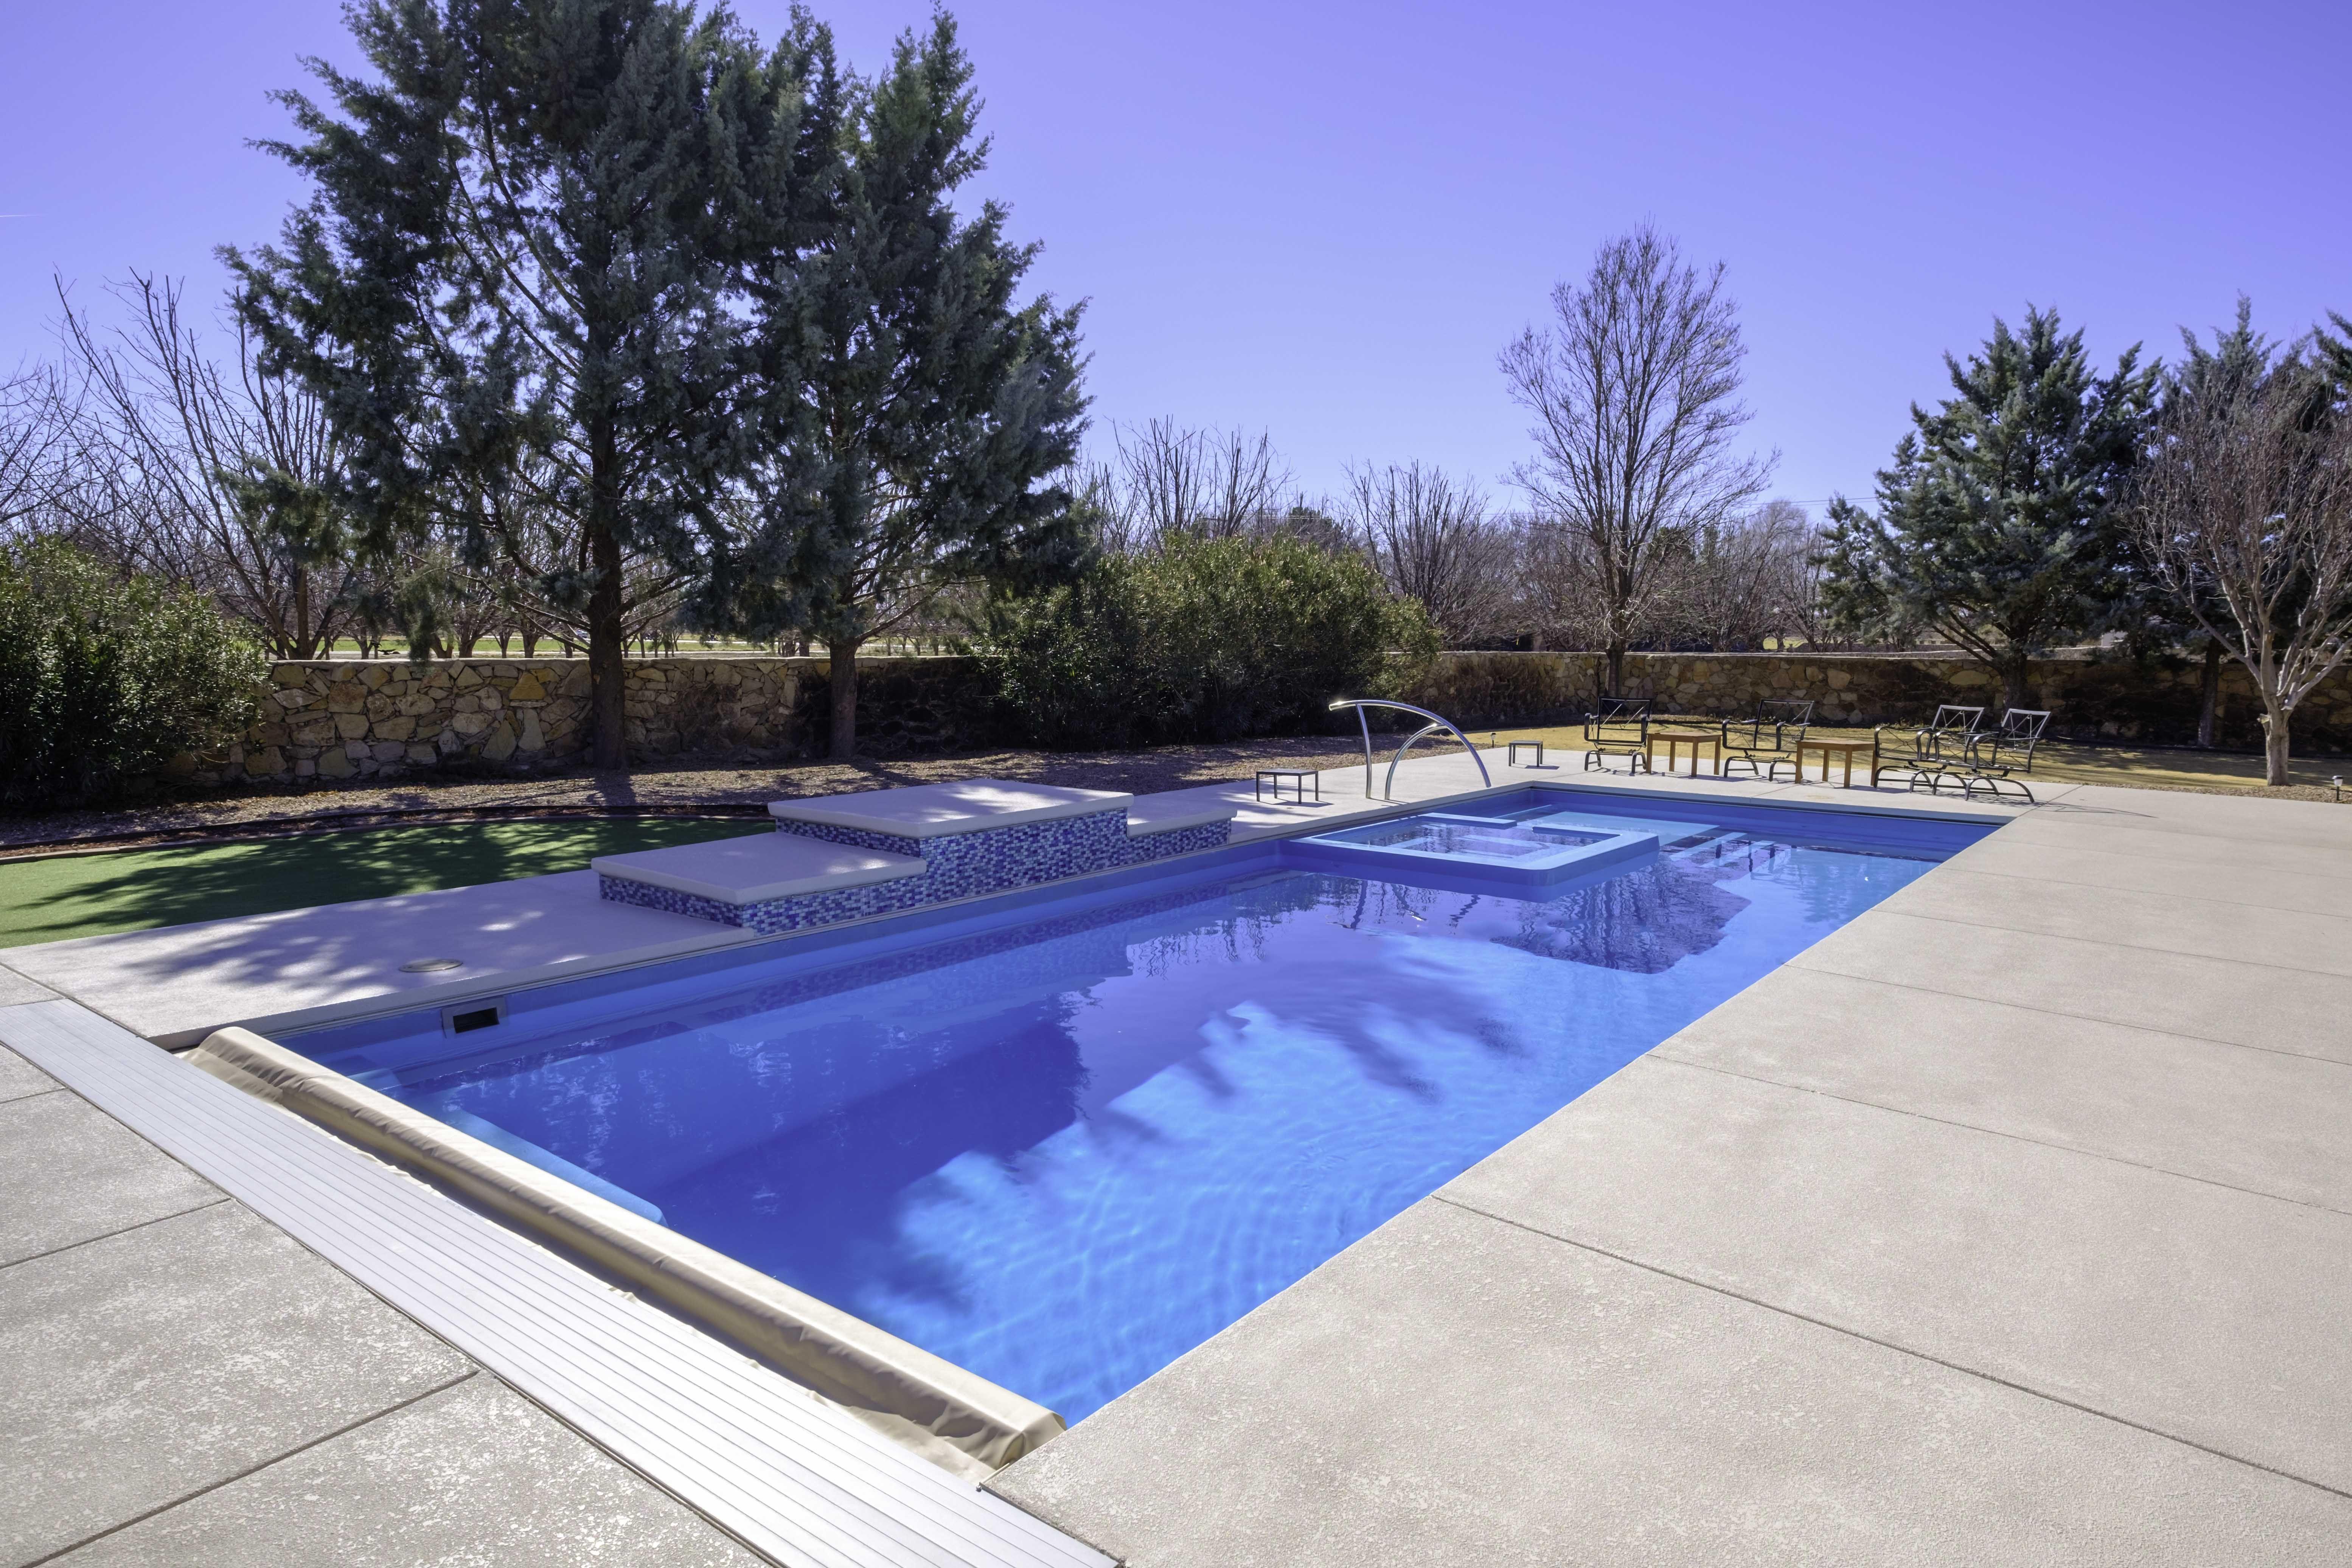 750 Imagine Pools World S Best Fiberglass Swimming Pools Ideas In 2021 Fiberglass Swimming Pools Swimming Pools Swimming